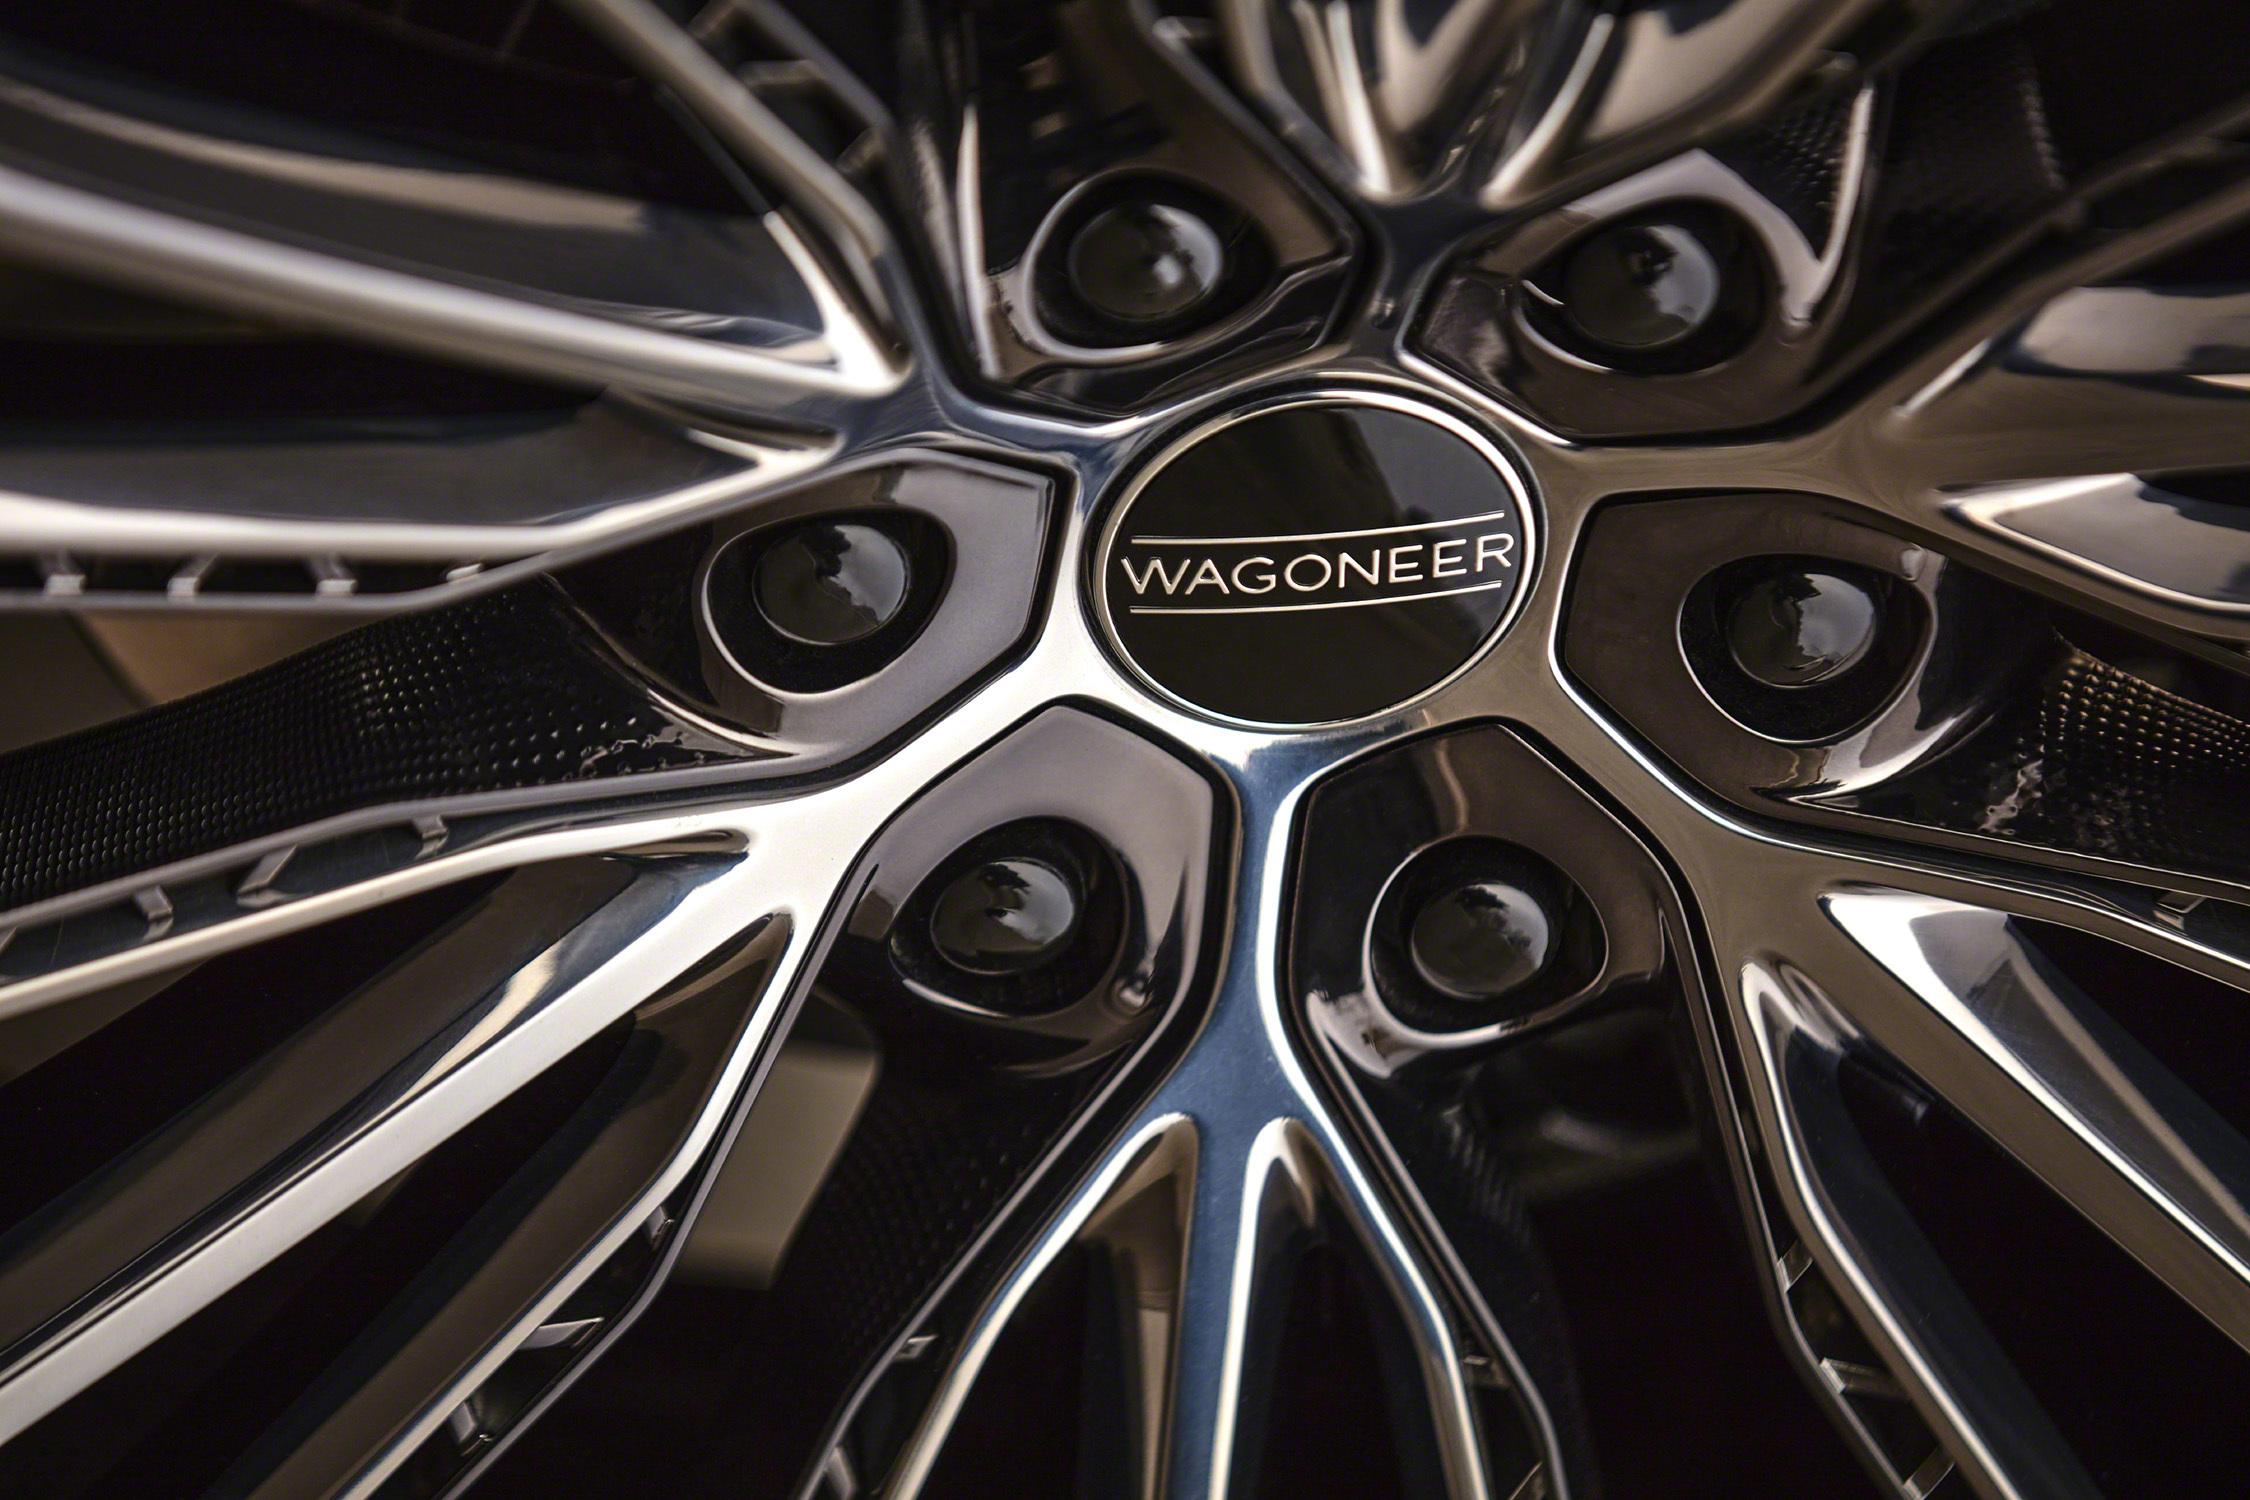 Grand Wagoneer Concept wheel close--up